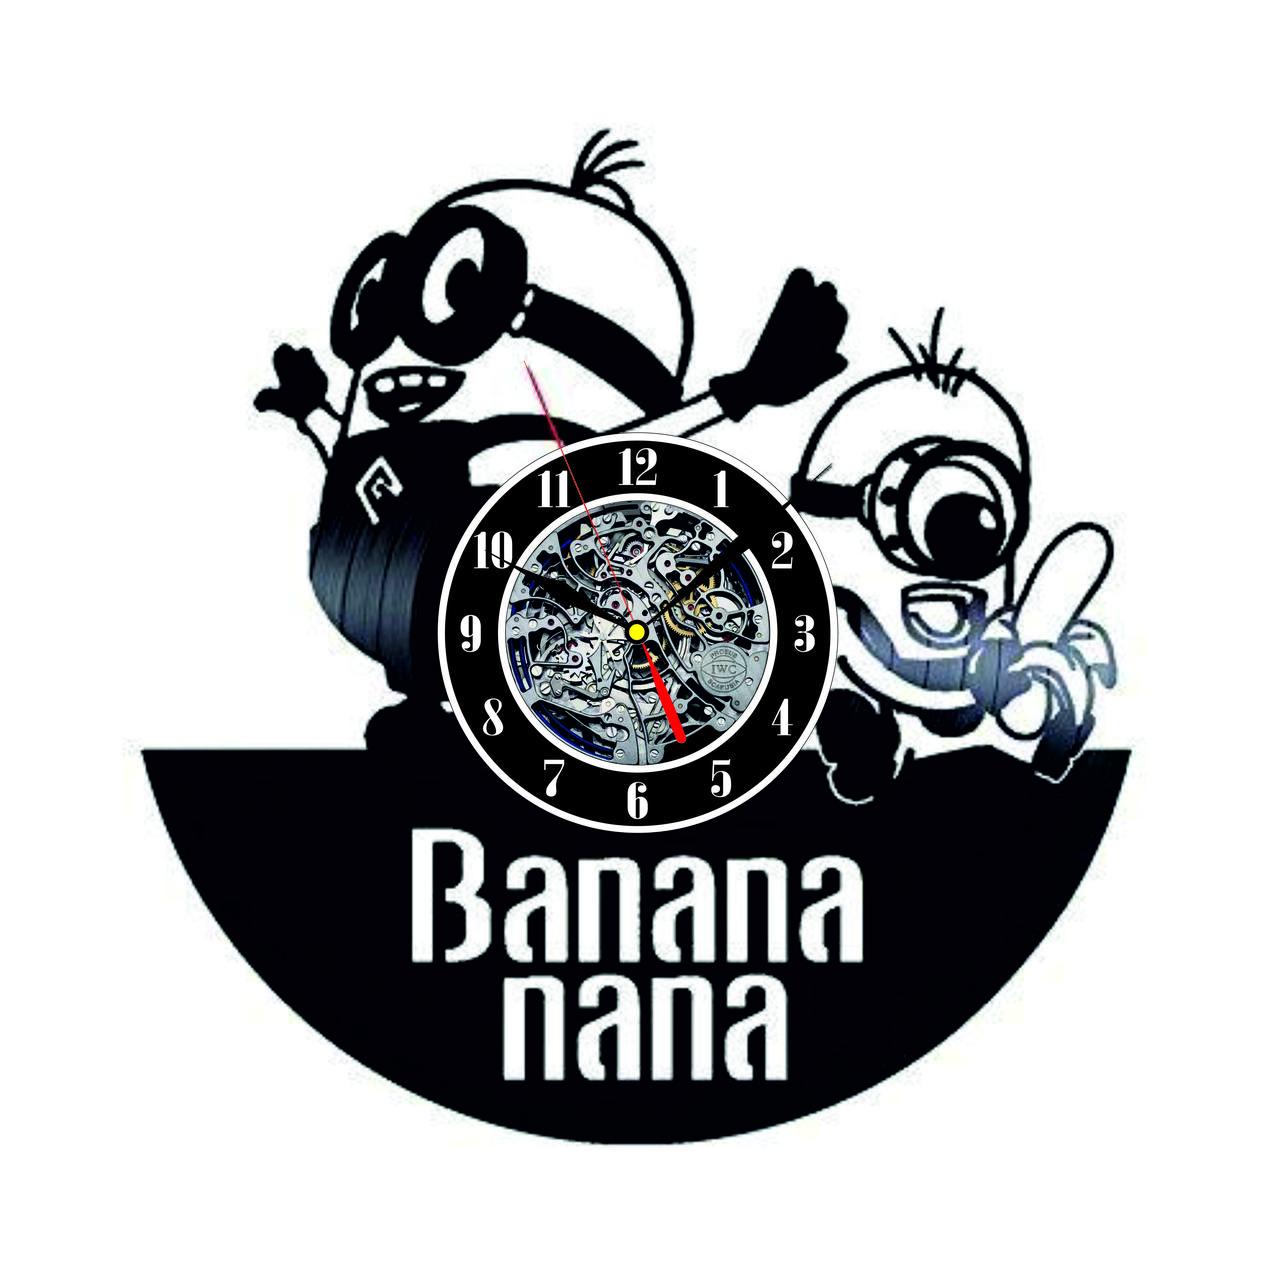 Настенные часы из виниловых пластинок LikeMark Minions